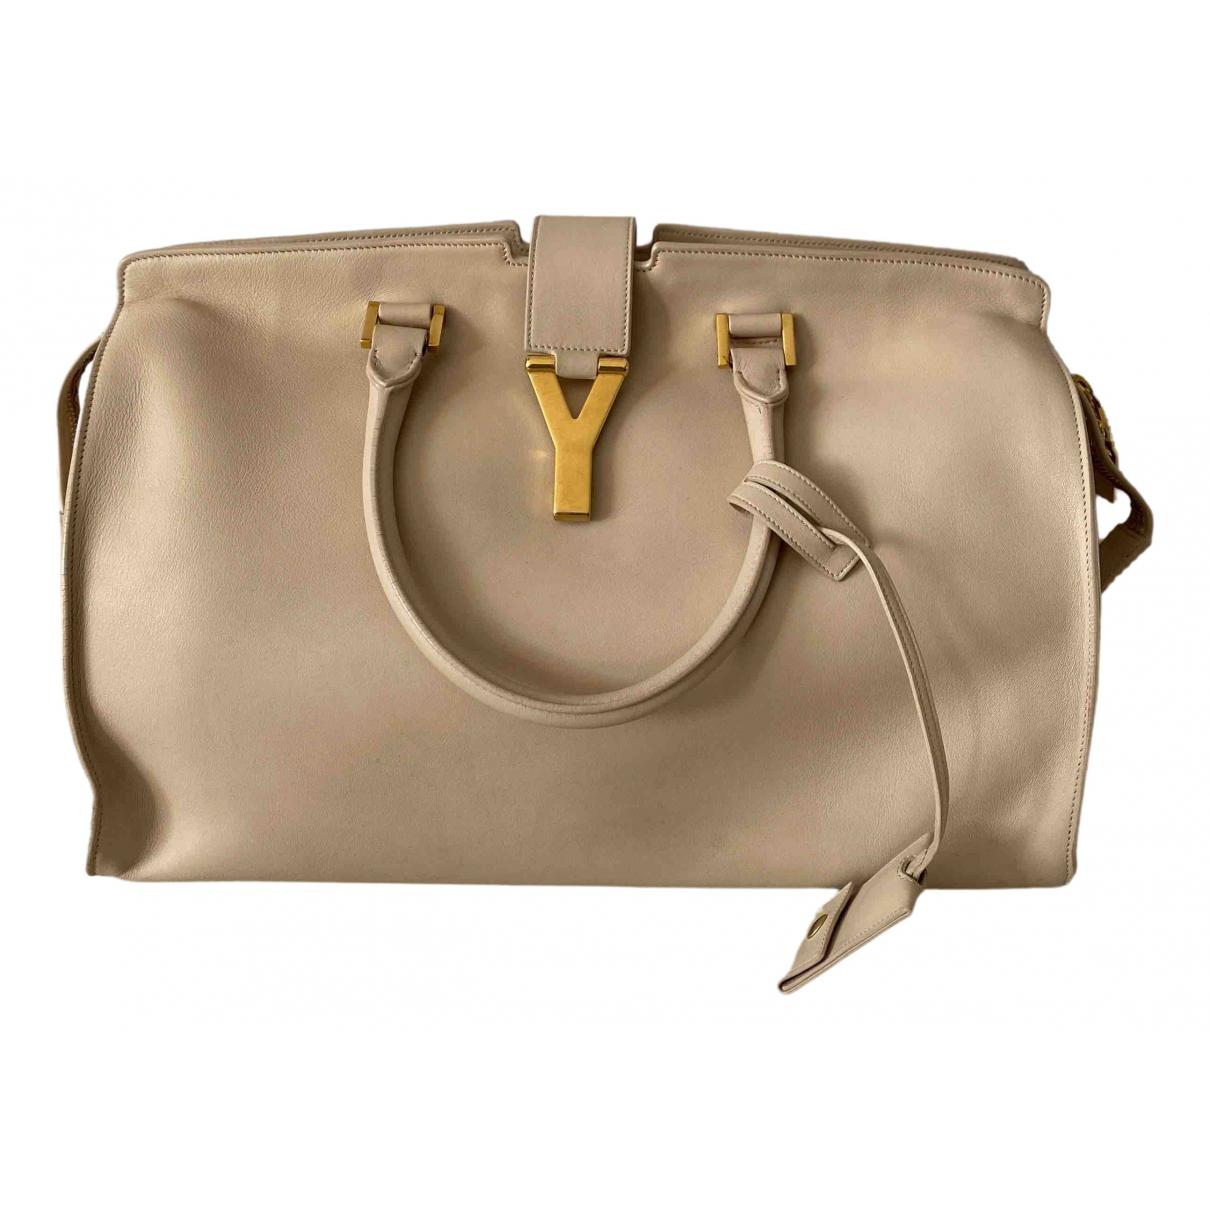 Saint Laurent Chyc Beige Leather handbag for Women N